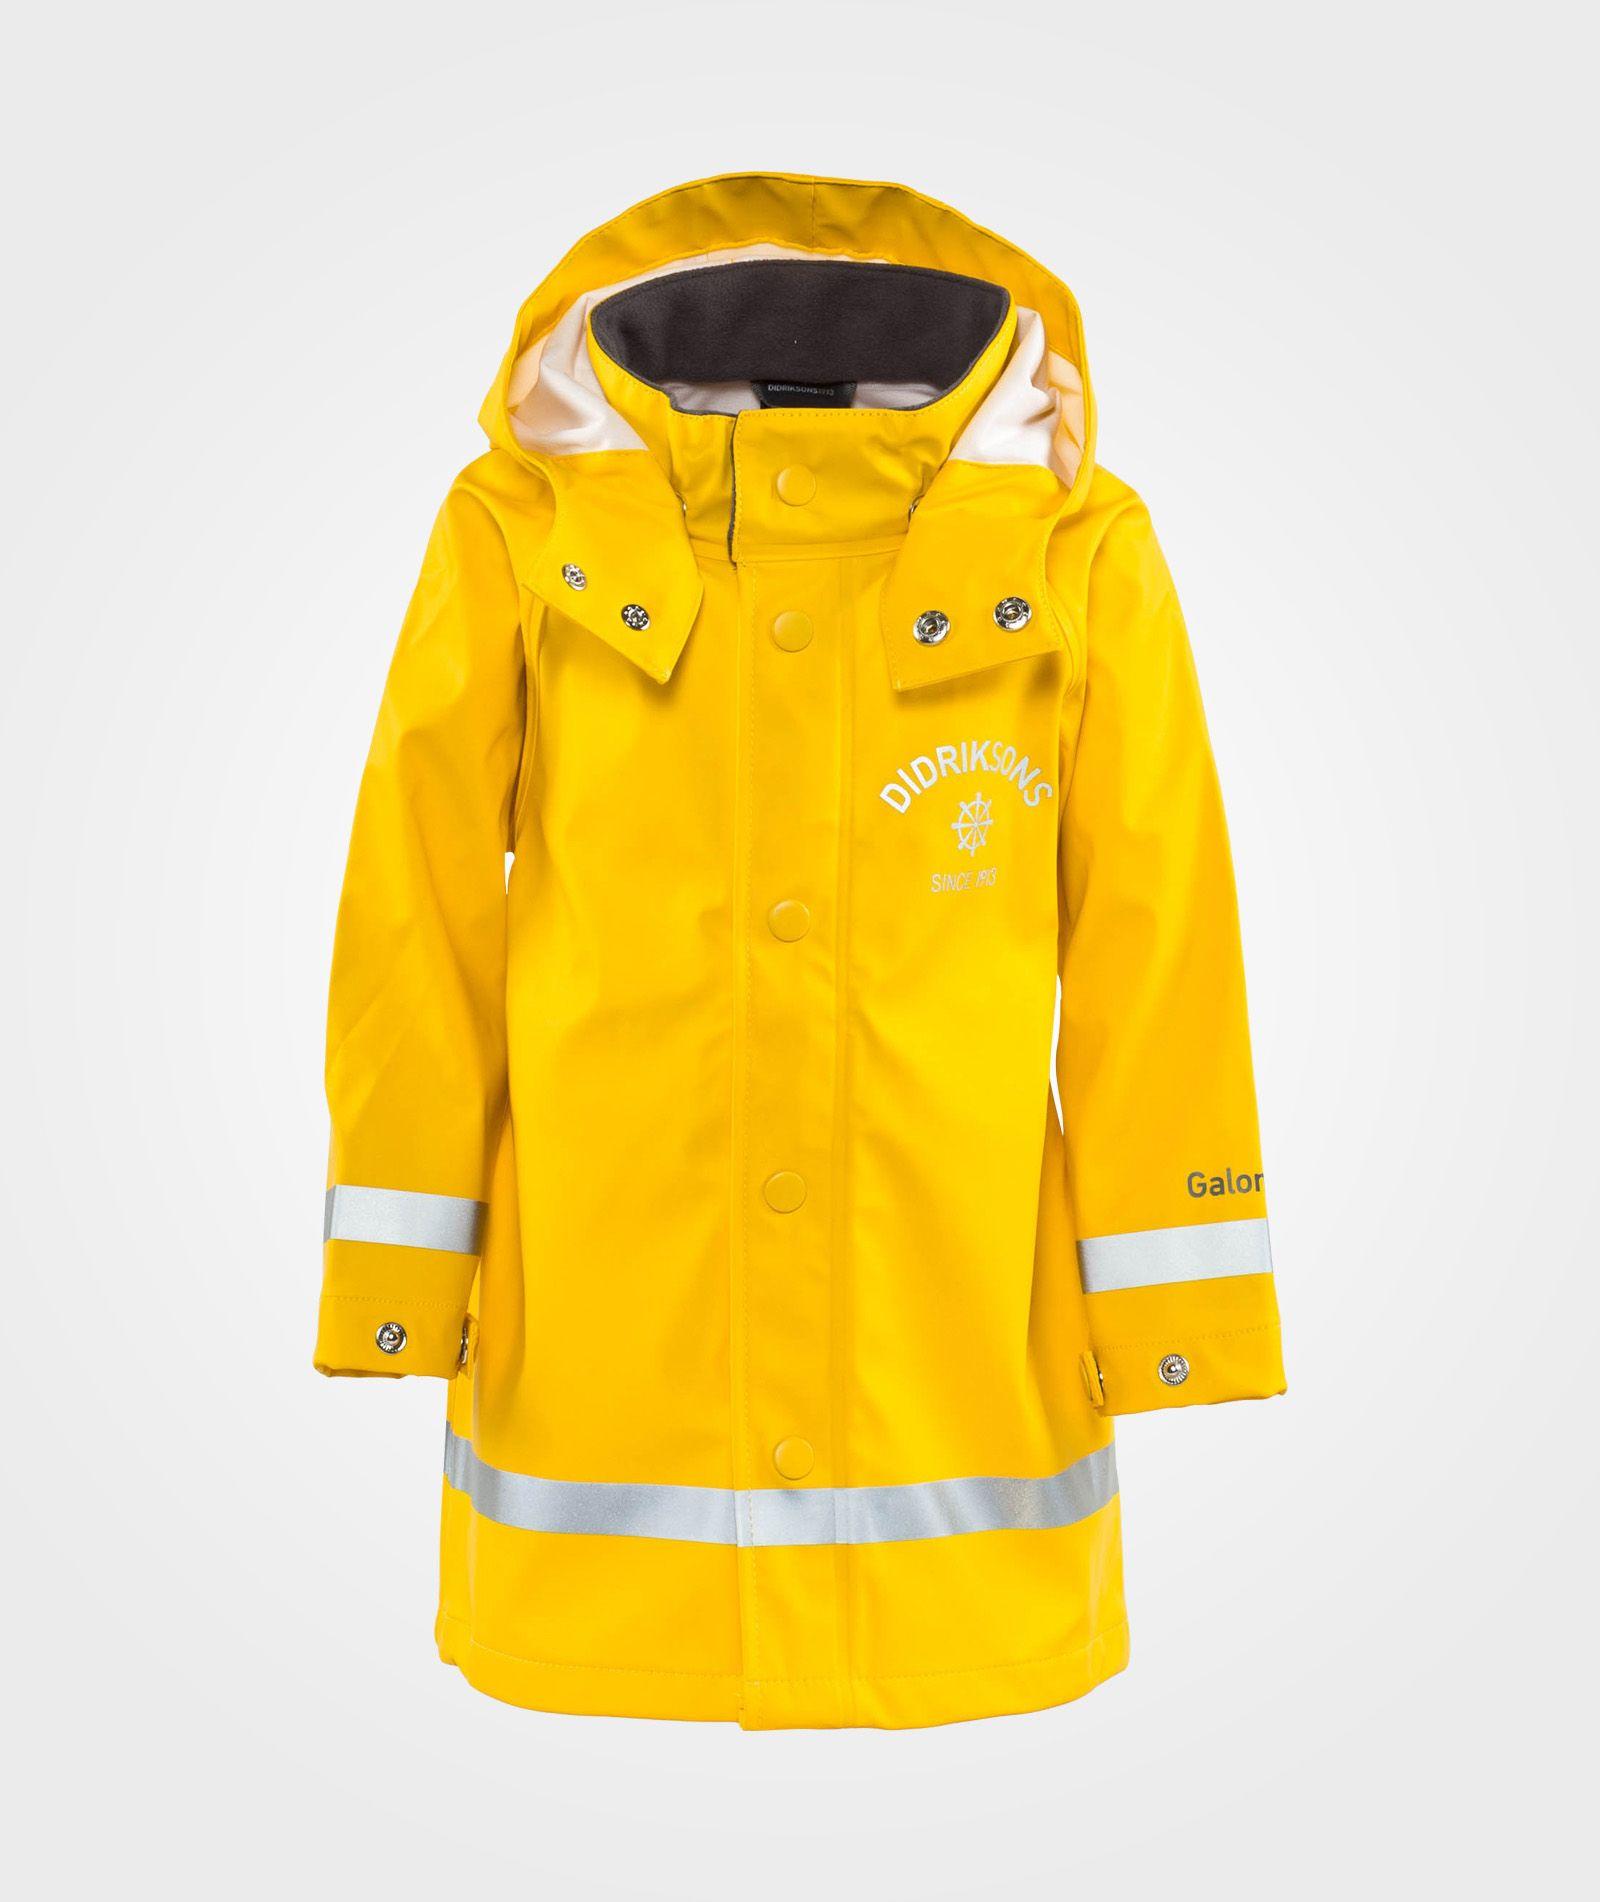 61ccbda3 Didriksons Babu Kids Jkt | Easter | Nike jacket, Rain jacket och ...